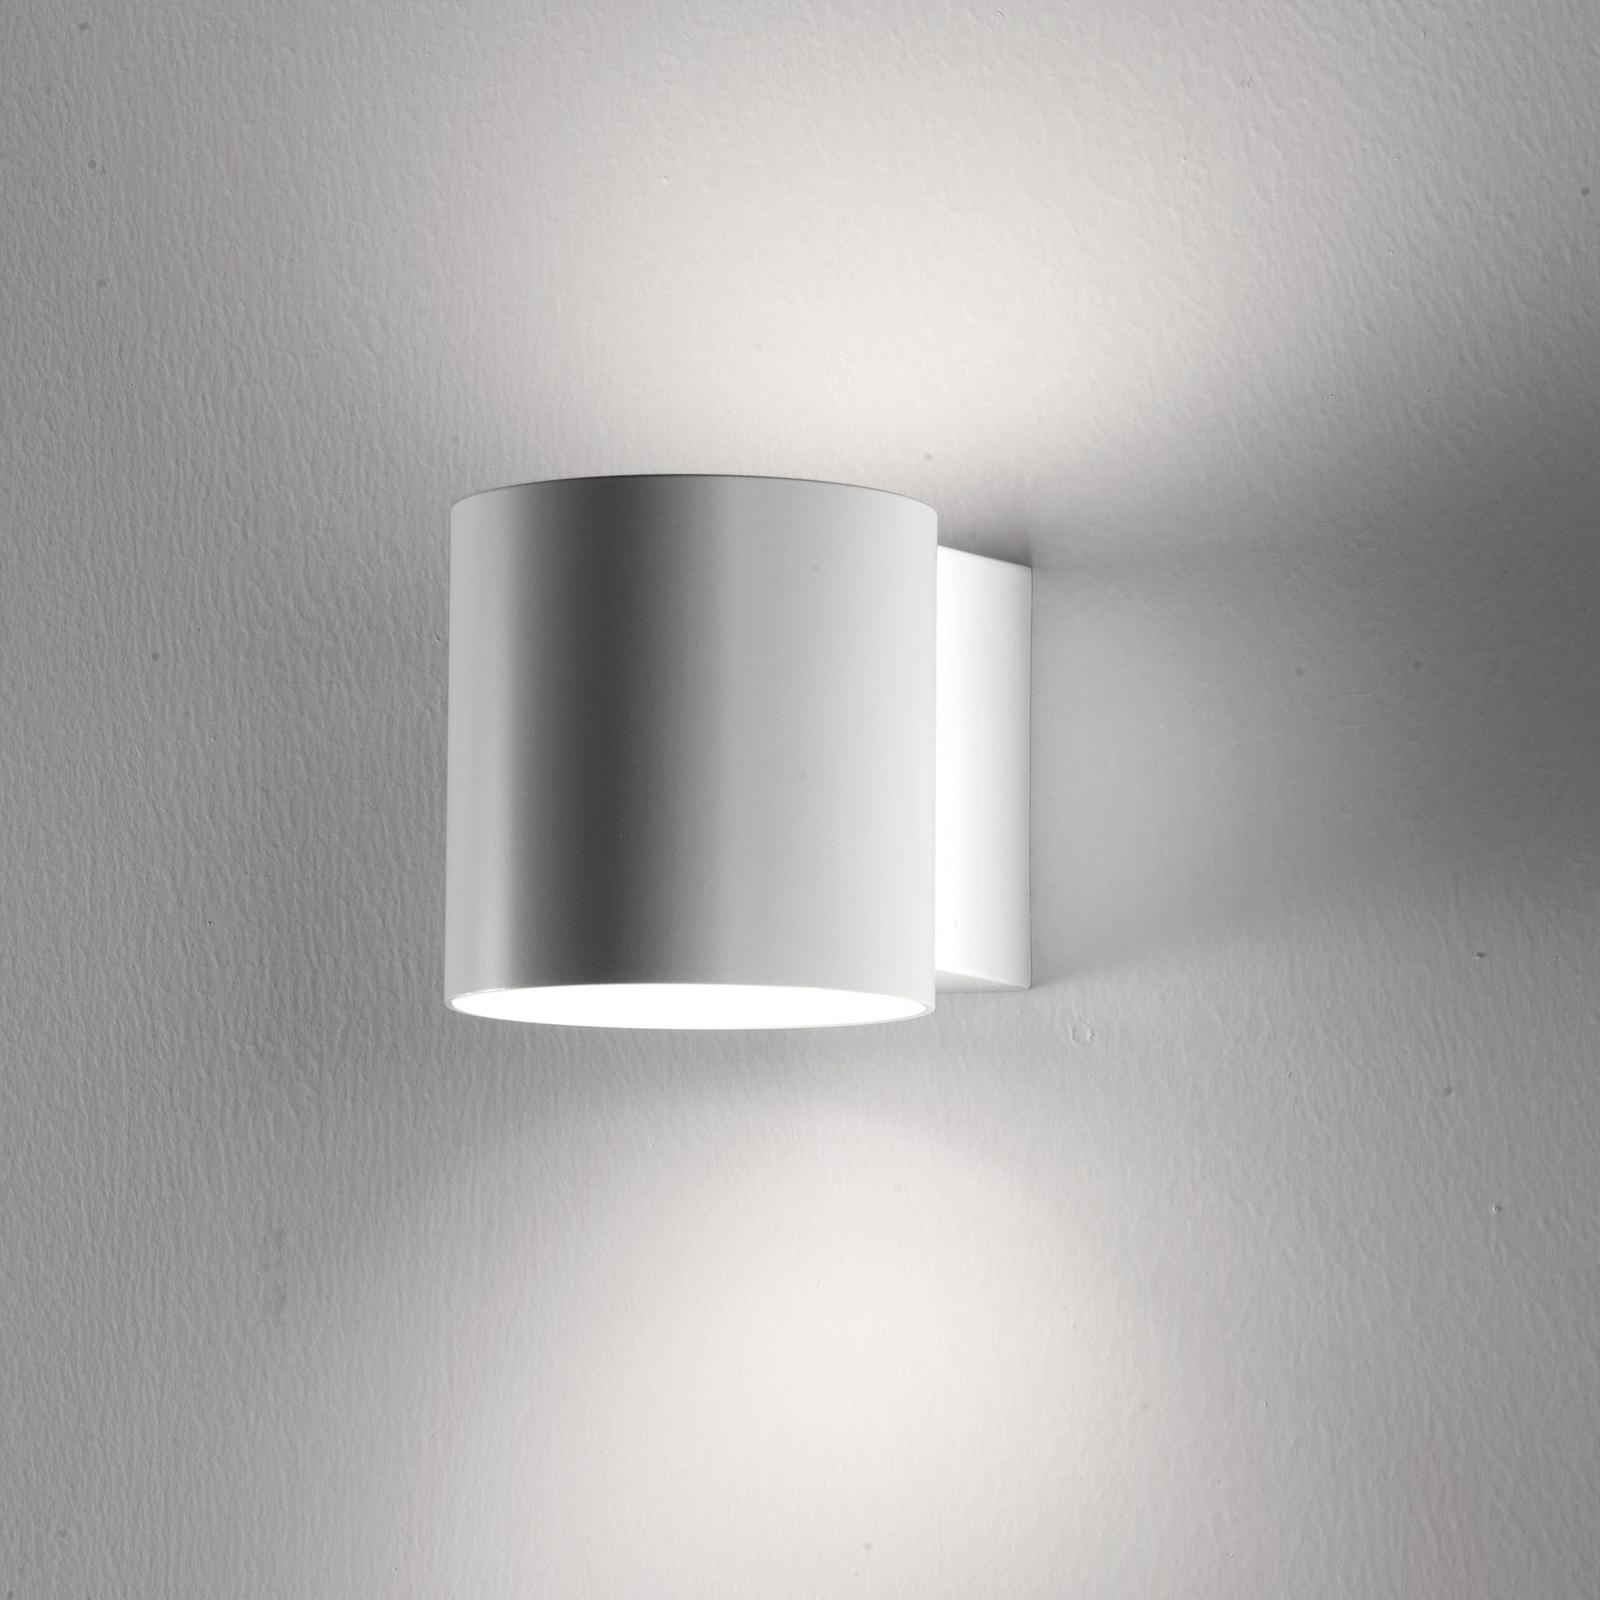 Martinelli Luce Tube Wandlampe, Metallschirm 14 cm